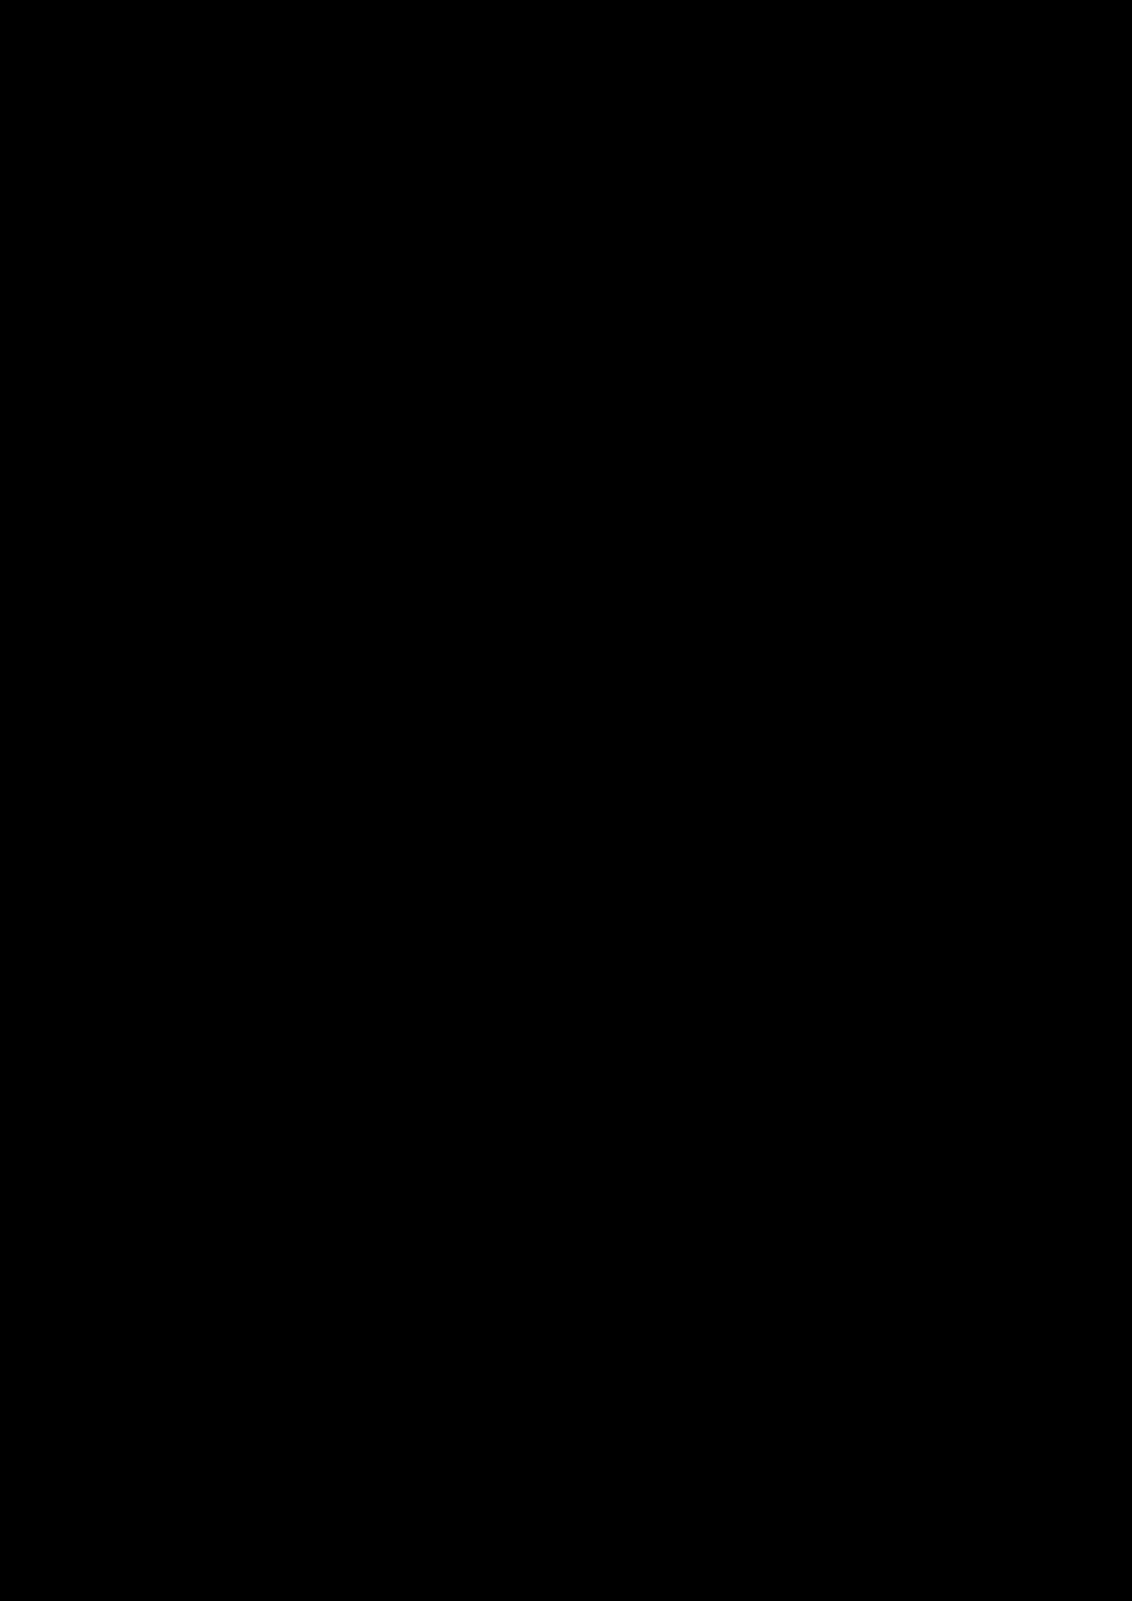 Korolevstvo slez slide, Image 33